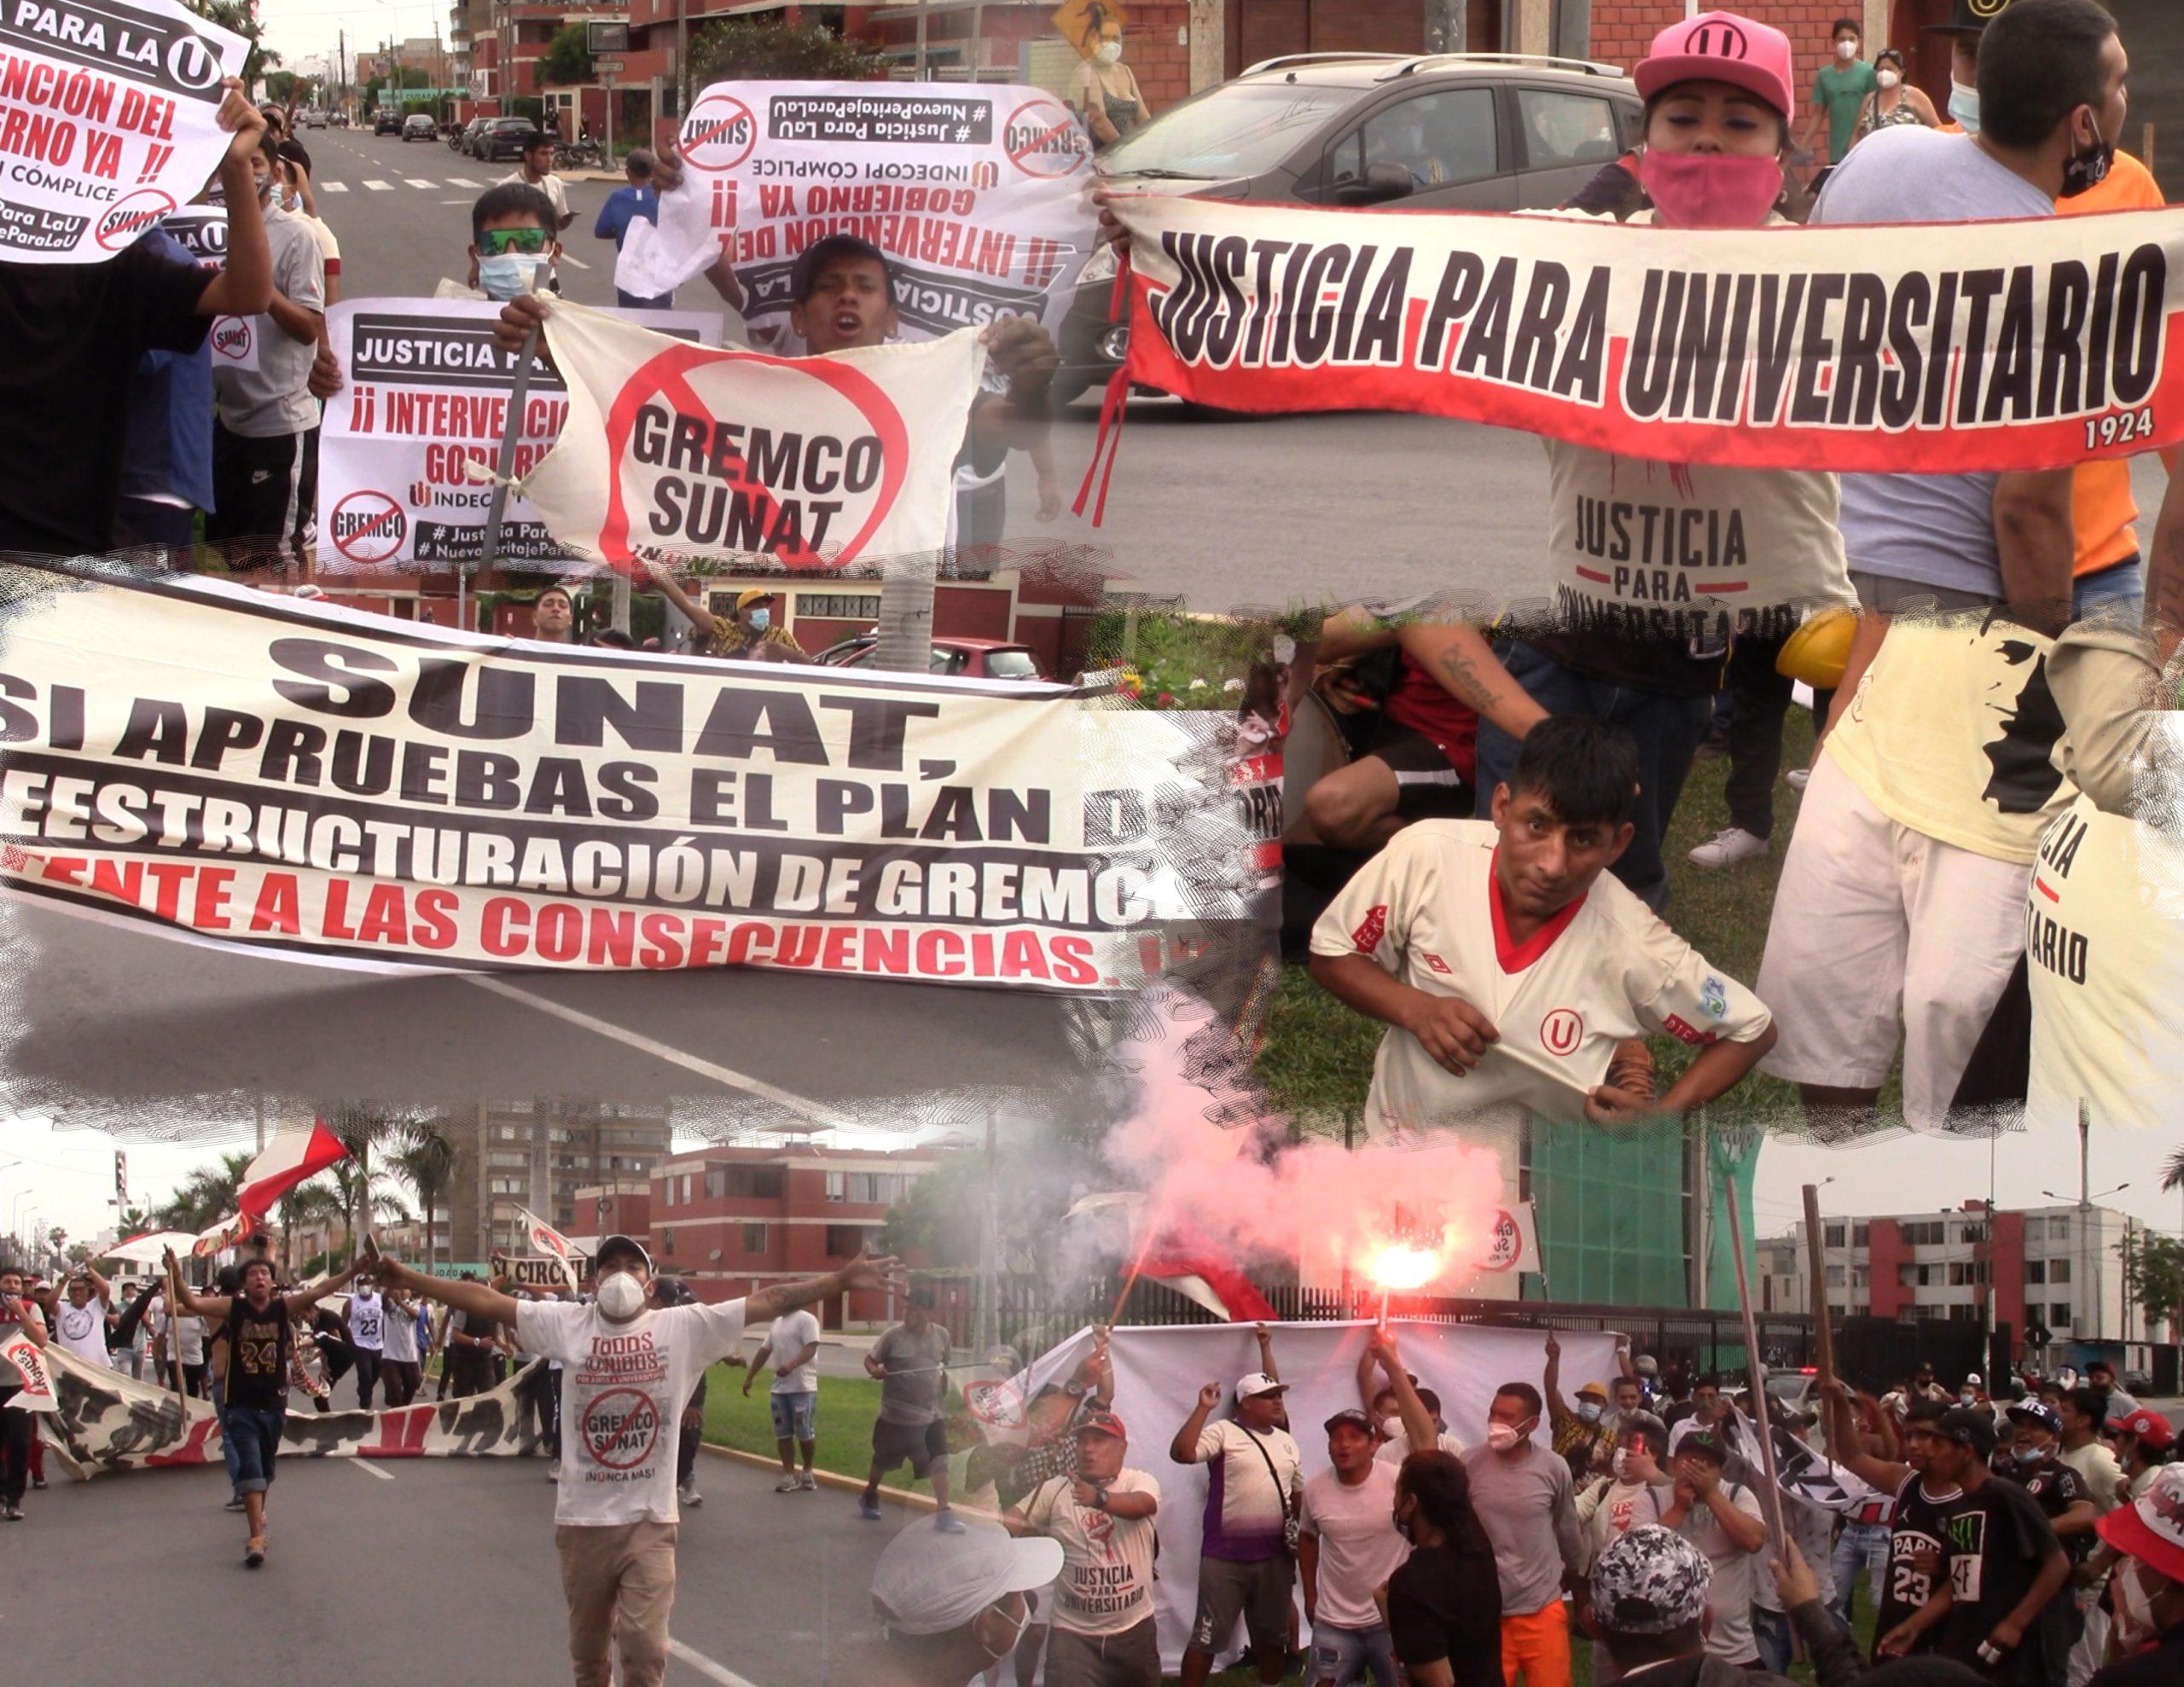 Hinchas de Universitario realizaron protesta pacífica frente a Indecopi